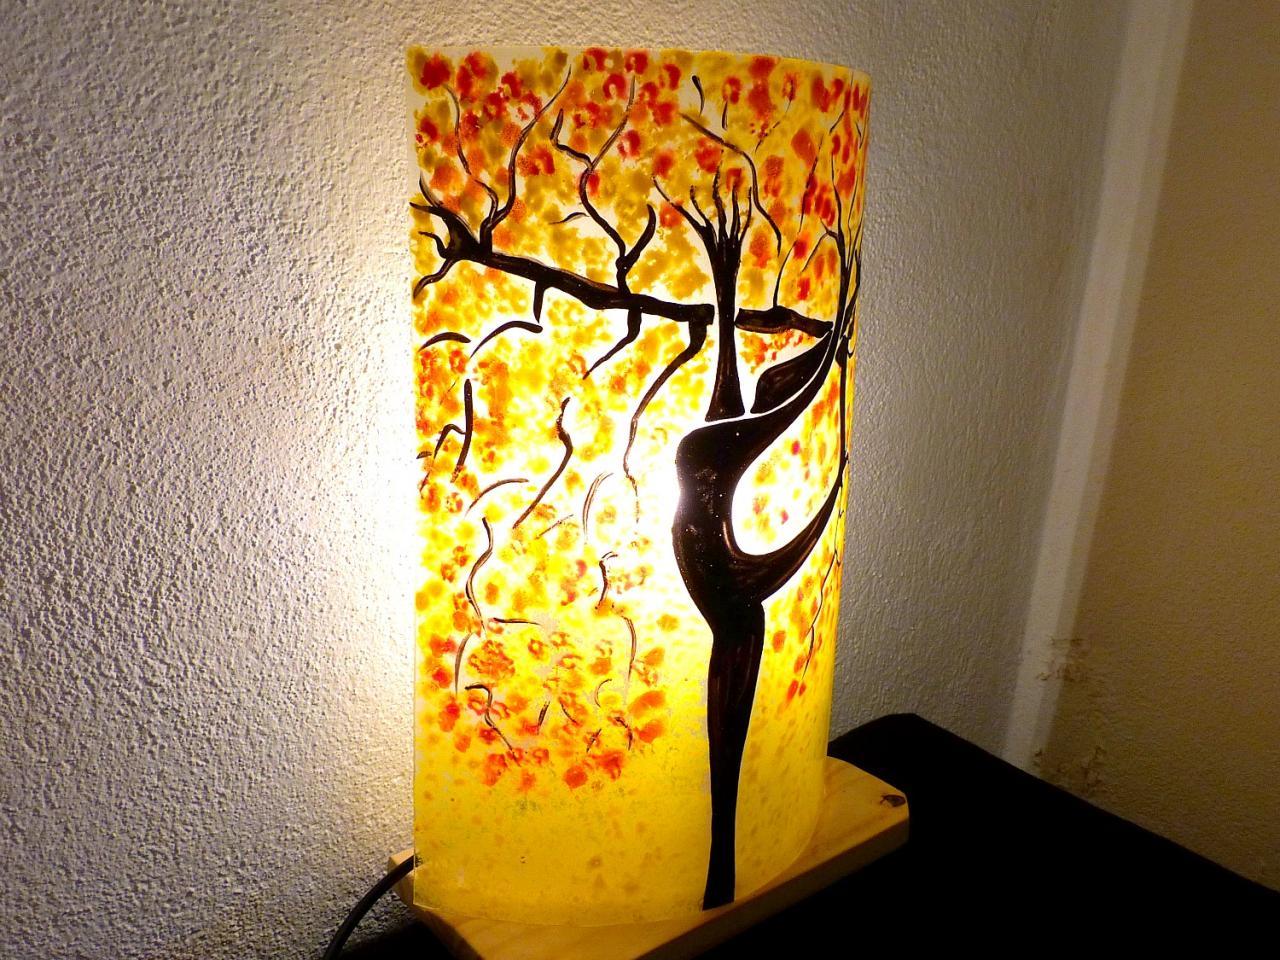 arbre-dansues-jaune5.jpg